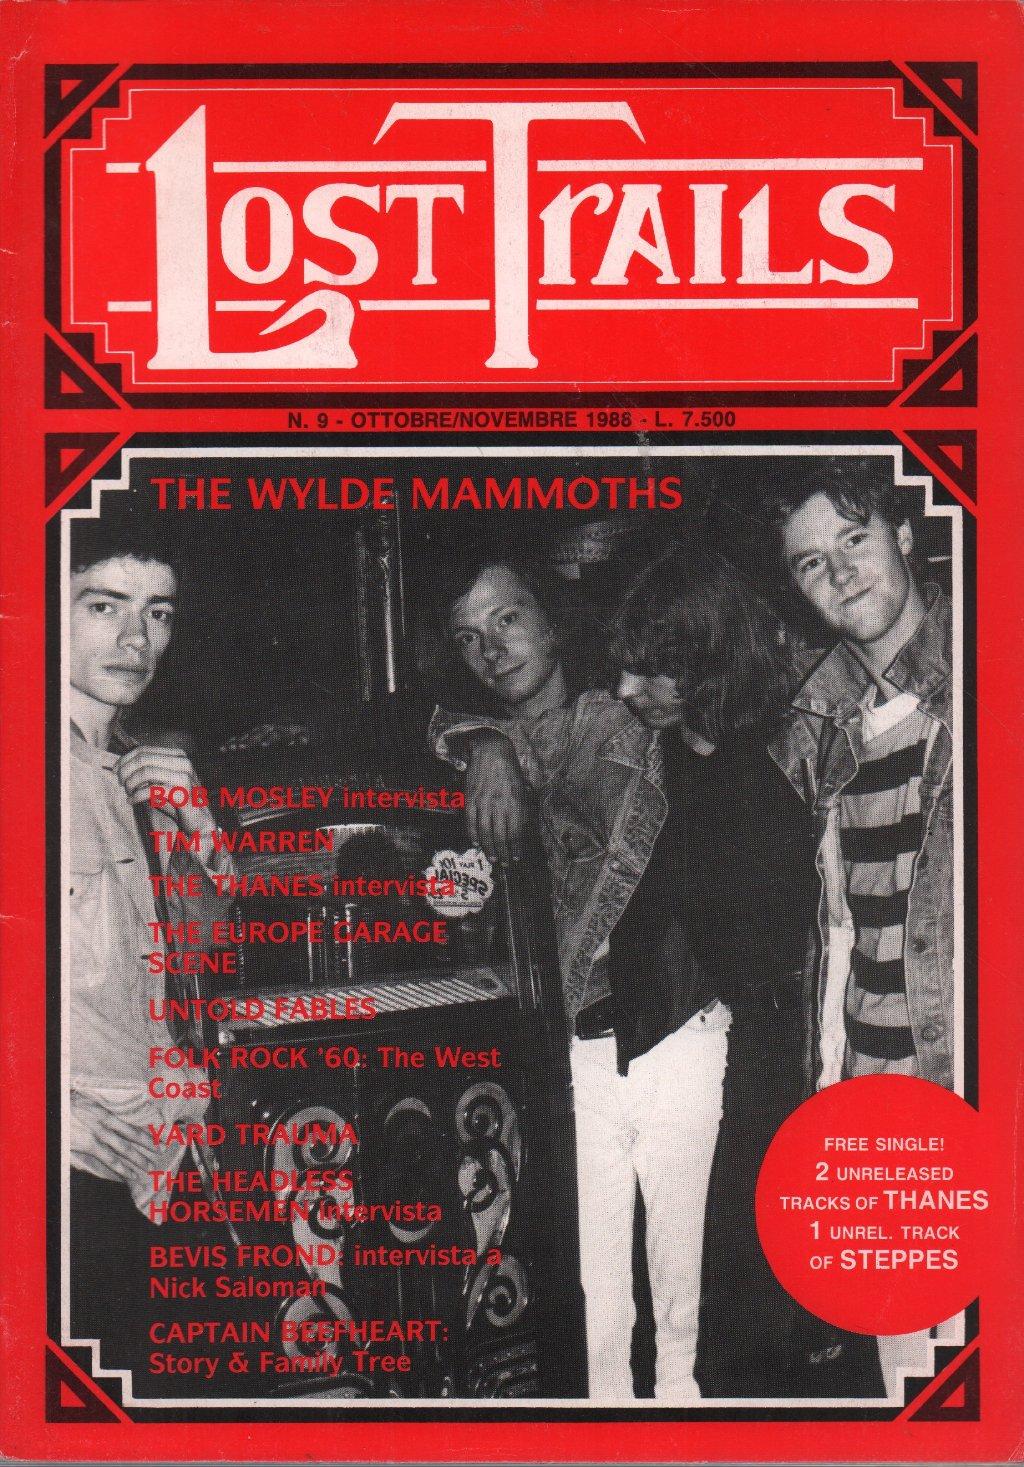 LOST TRAILS - No. 9 October/November 1988 - Magazine